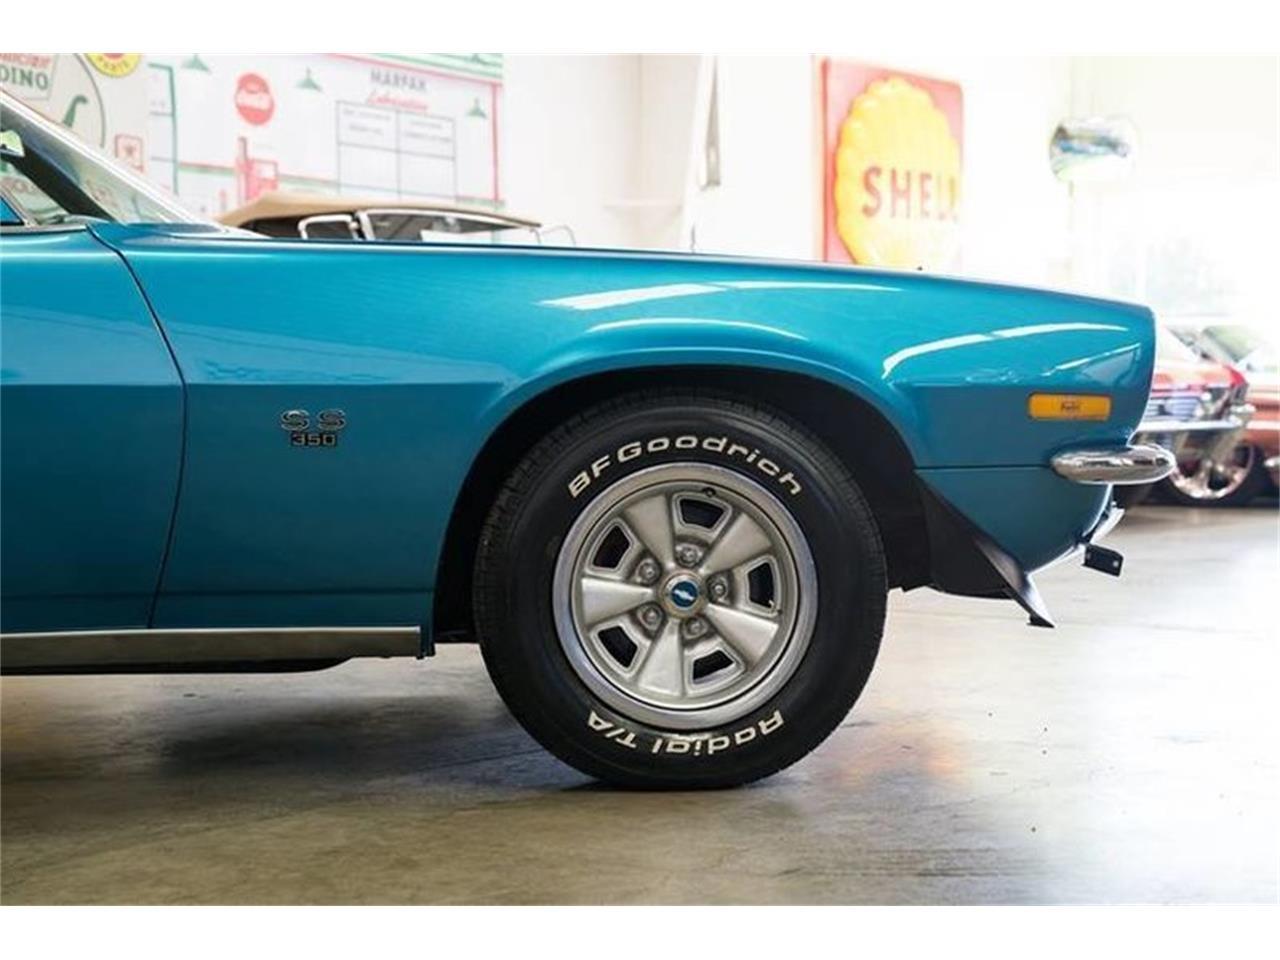 Large Picture of 1970 Camaro located in Grand Rapids Michigan - $31,990.00 - LD3M